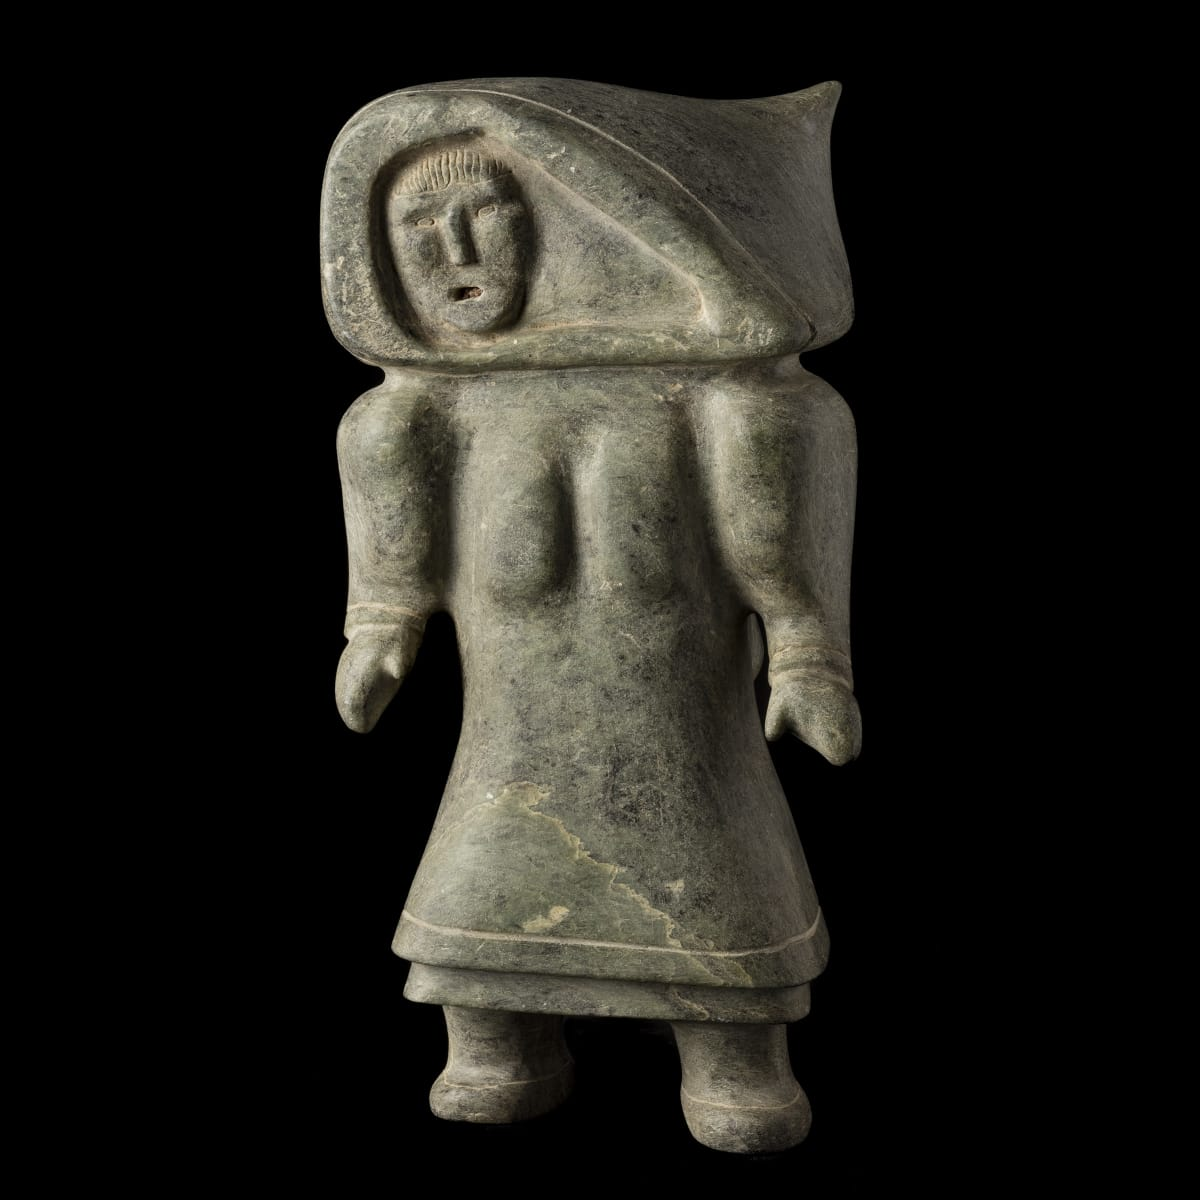 Solomonie Tigullaraq (1924-2000) KANGIQTUGAAPIK (CLYDE RIVER) Standing Woman, c. 1966 REALIZED: $2,040